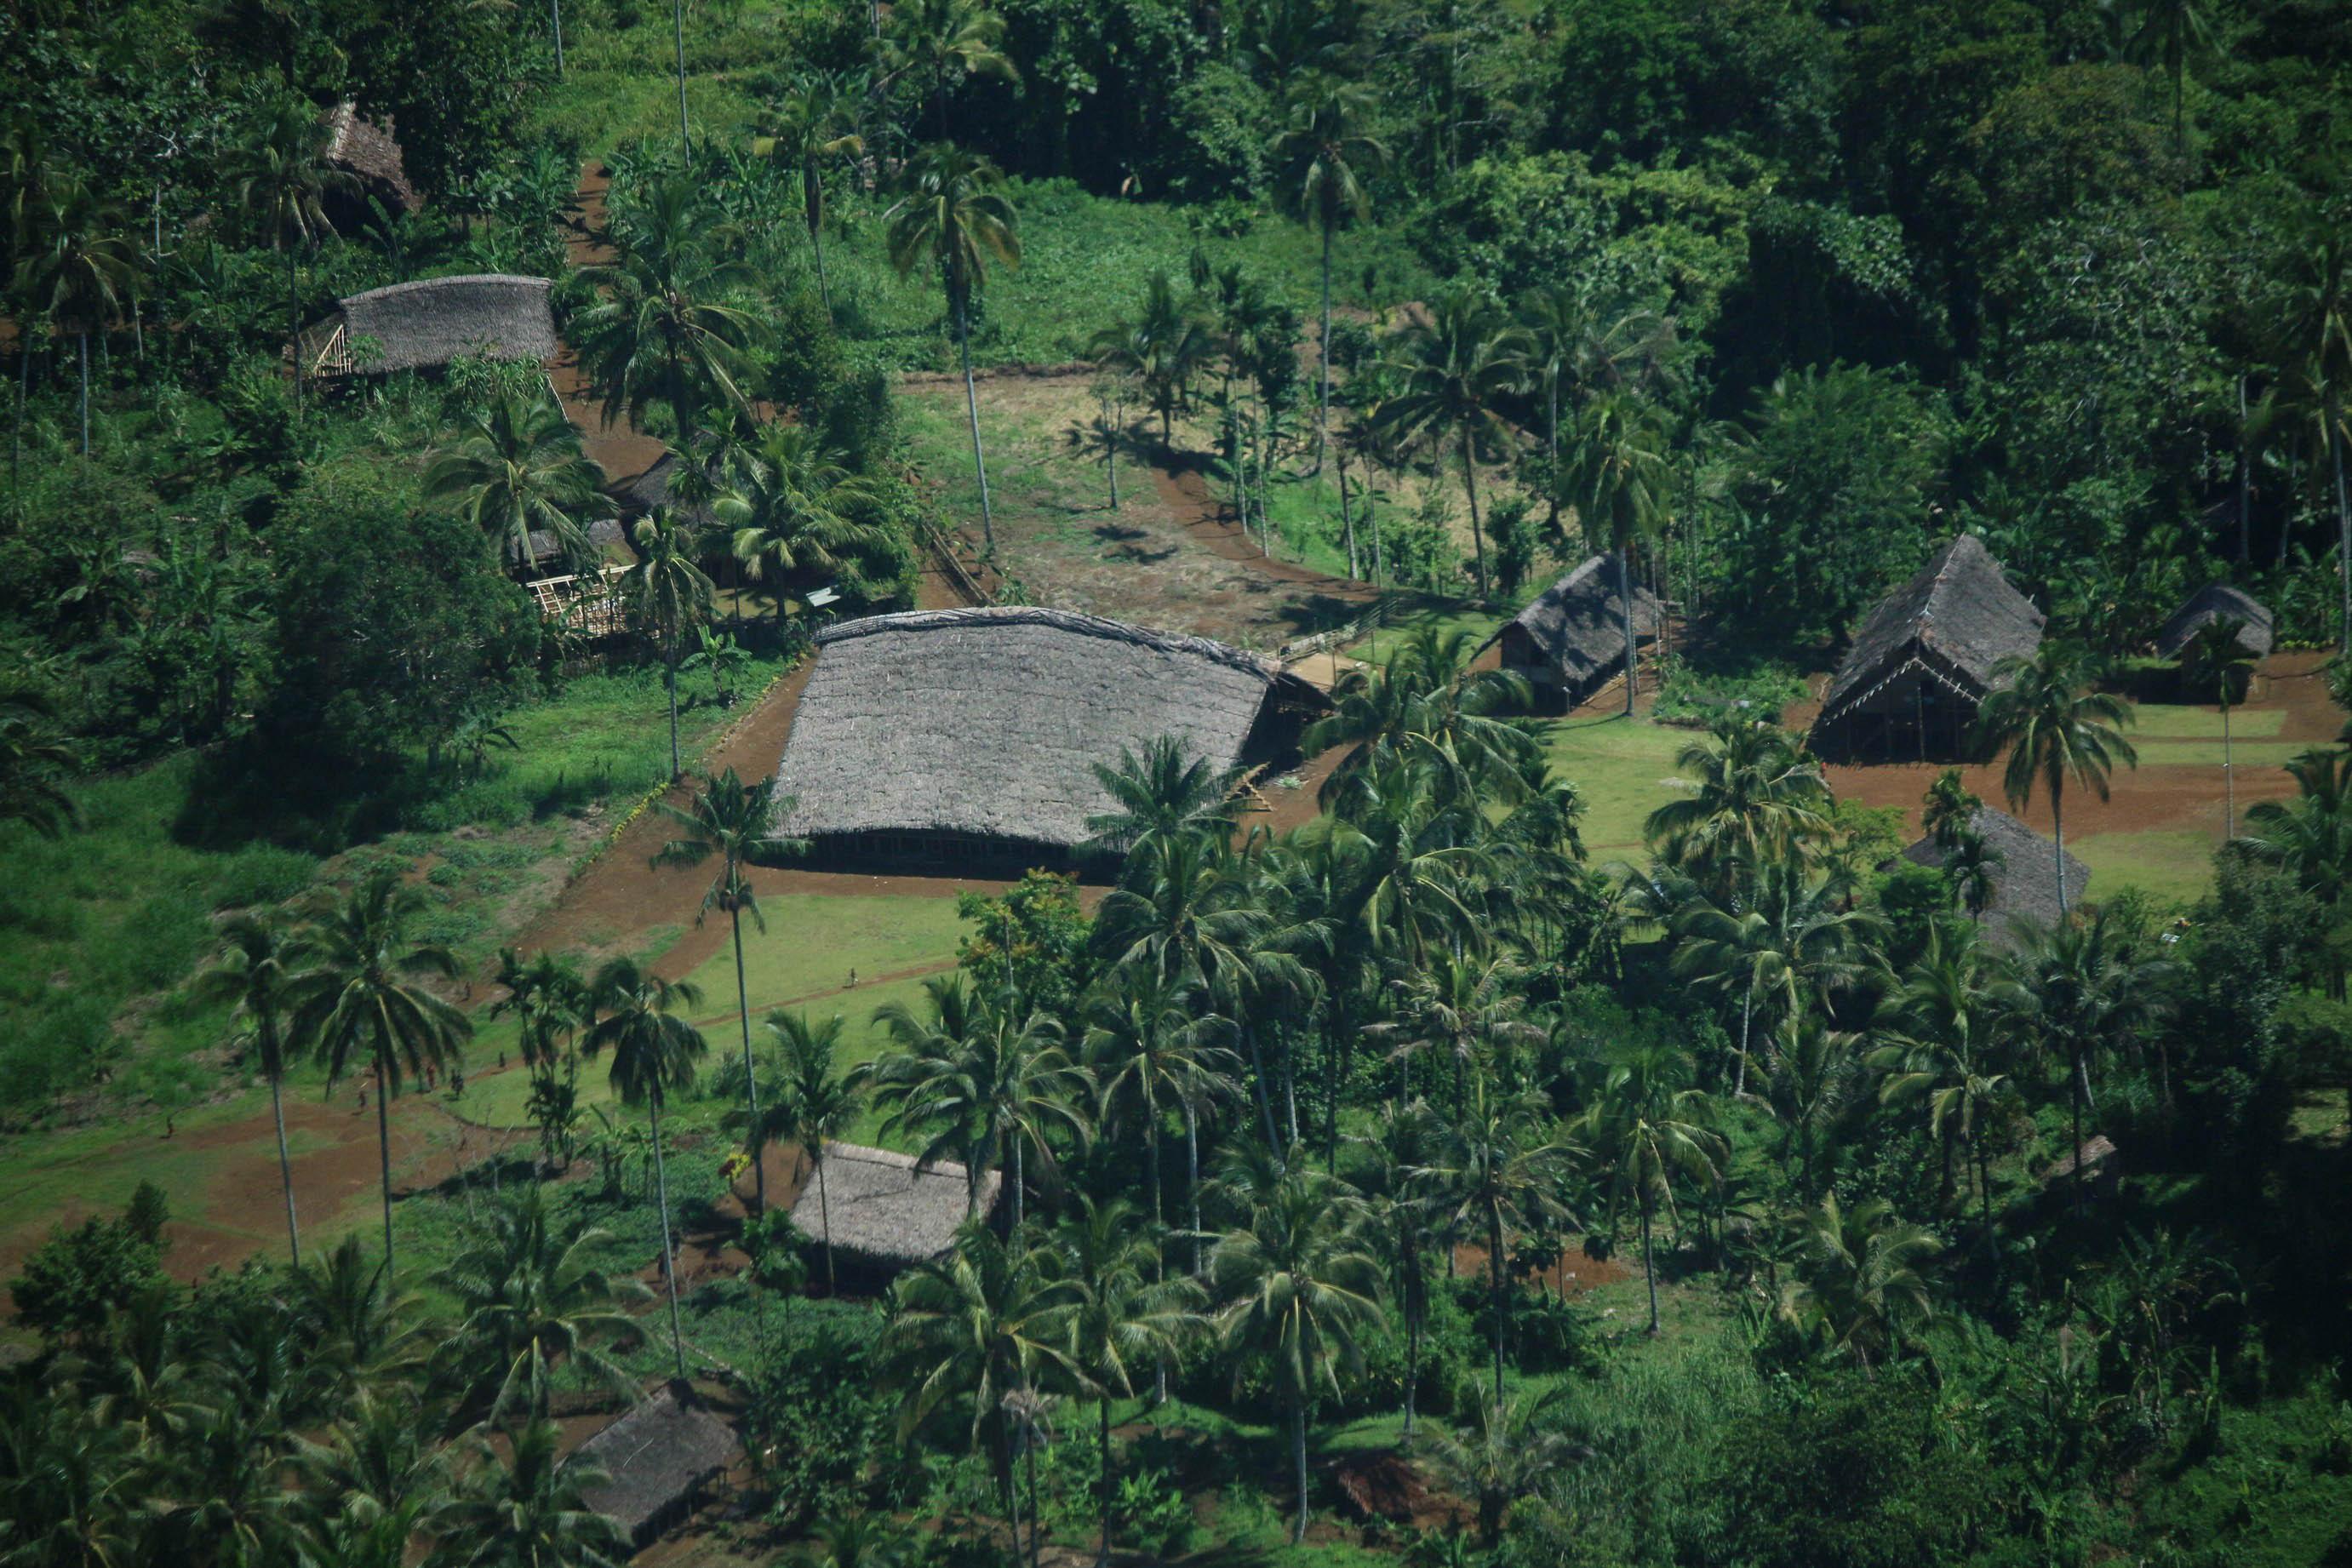 MAF providing assistance following earthquake in Papua New Guinea